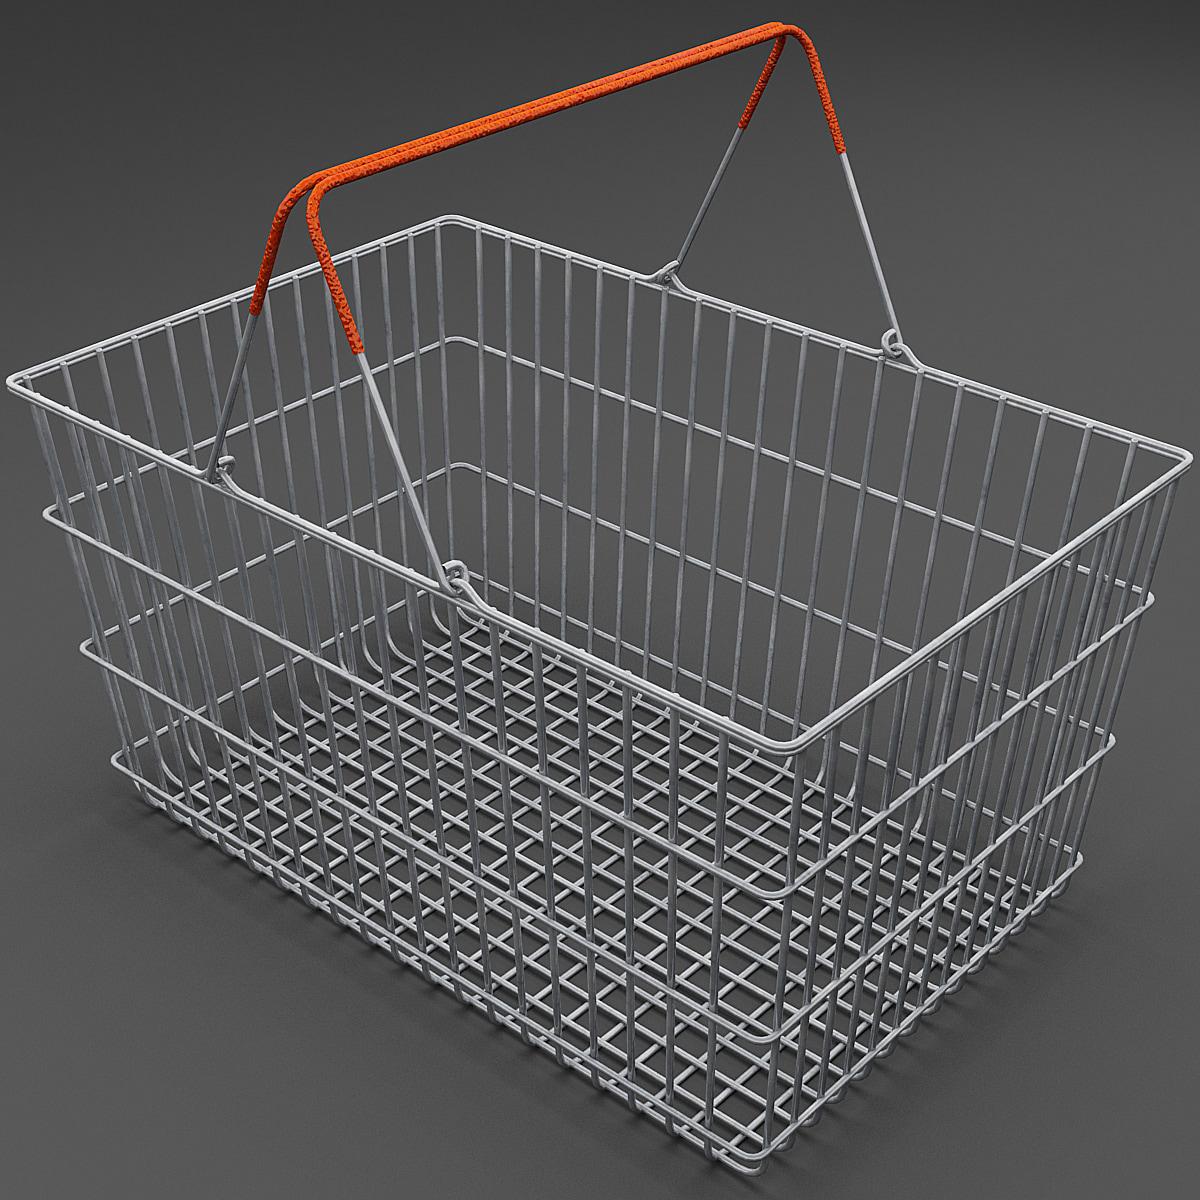 Supermarket_Shopping_Basket_Vray_1.jpg